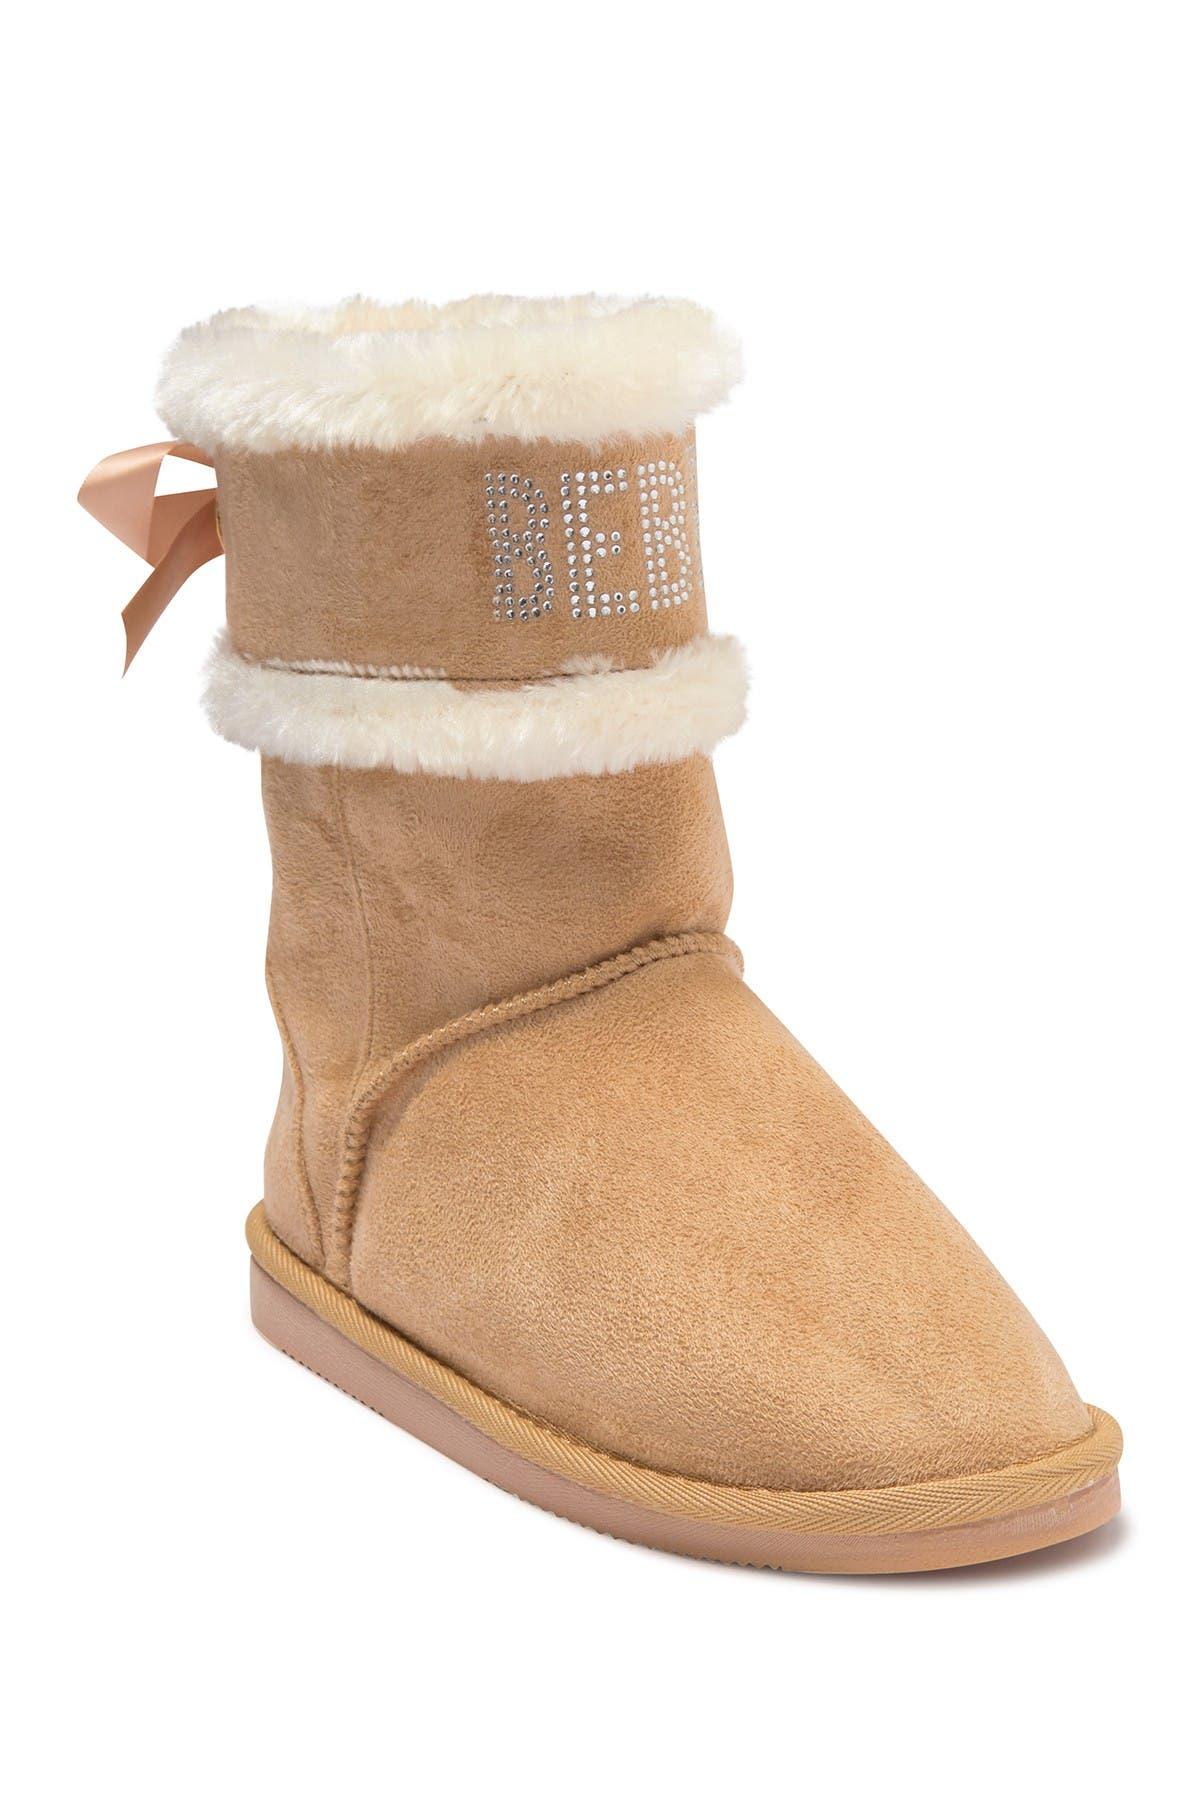 Image of bebe Microsuede Winter Boot